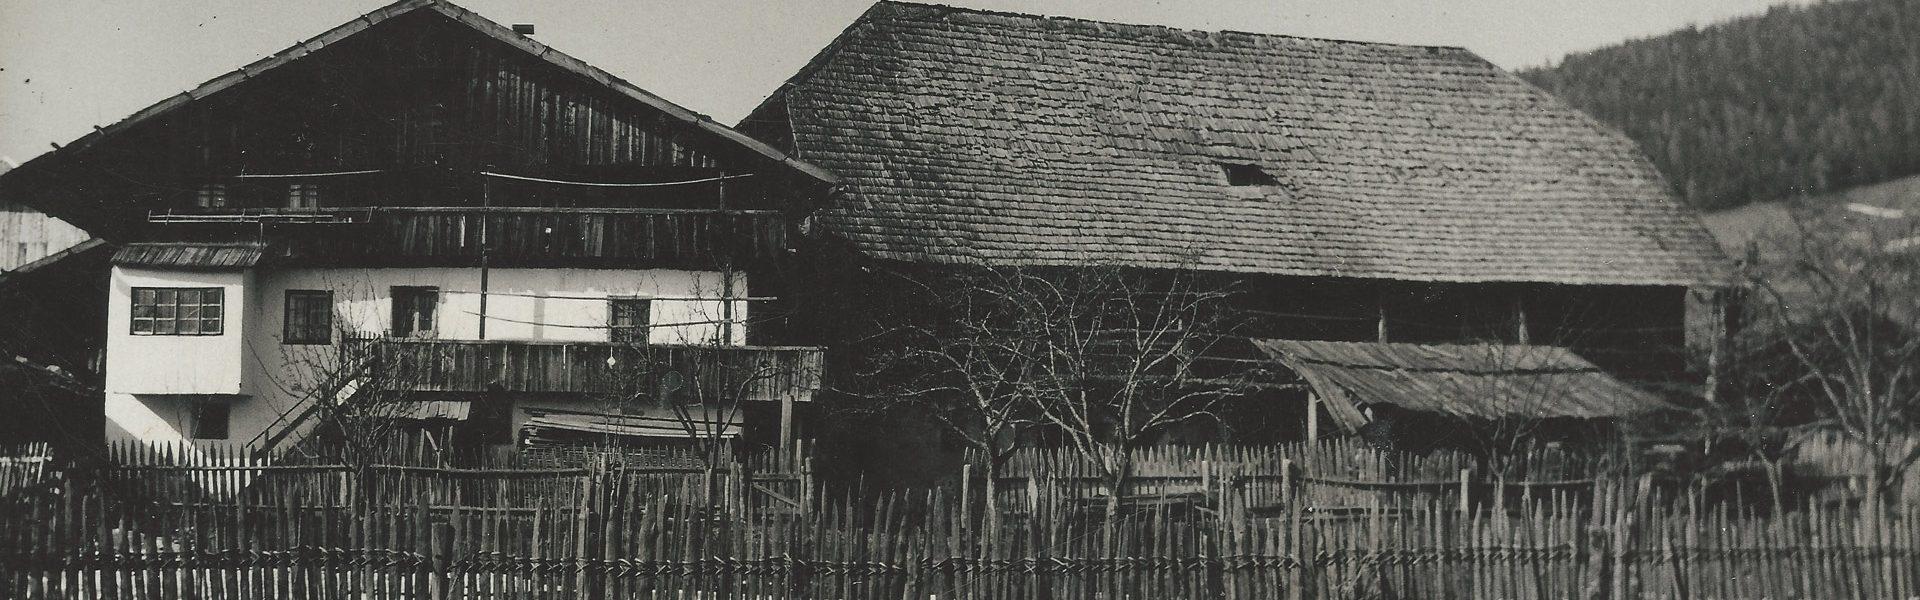 Moarhof-1940